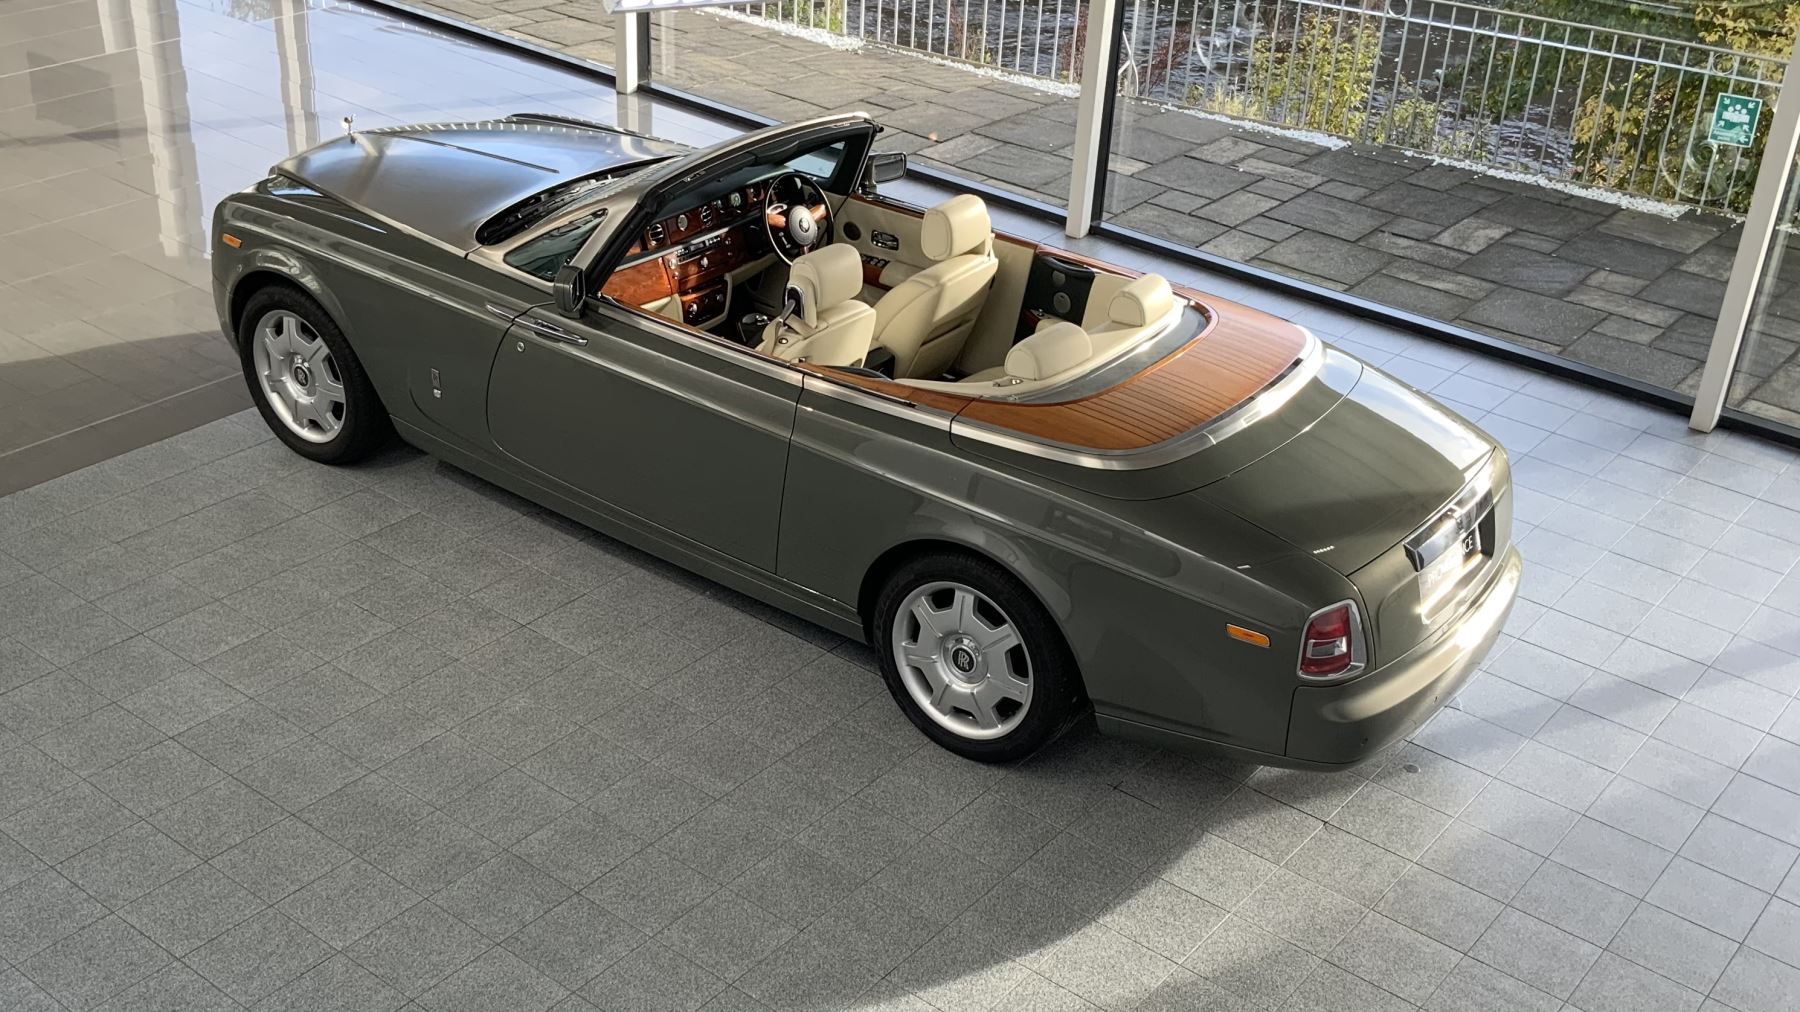 Rolls-Royce Phantom Drophead Coupe 2dr Auto image 30